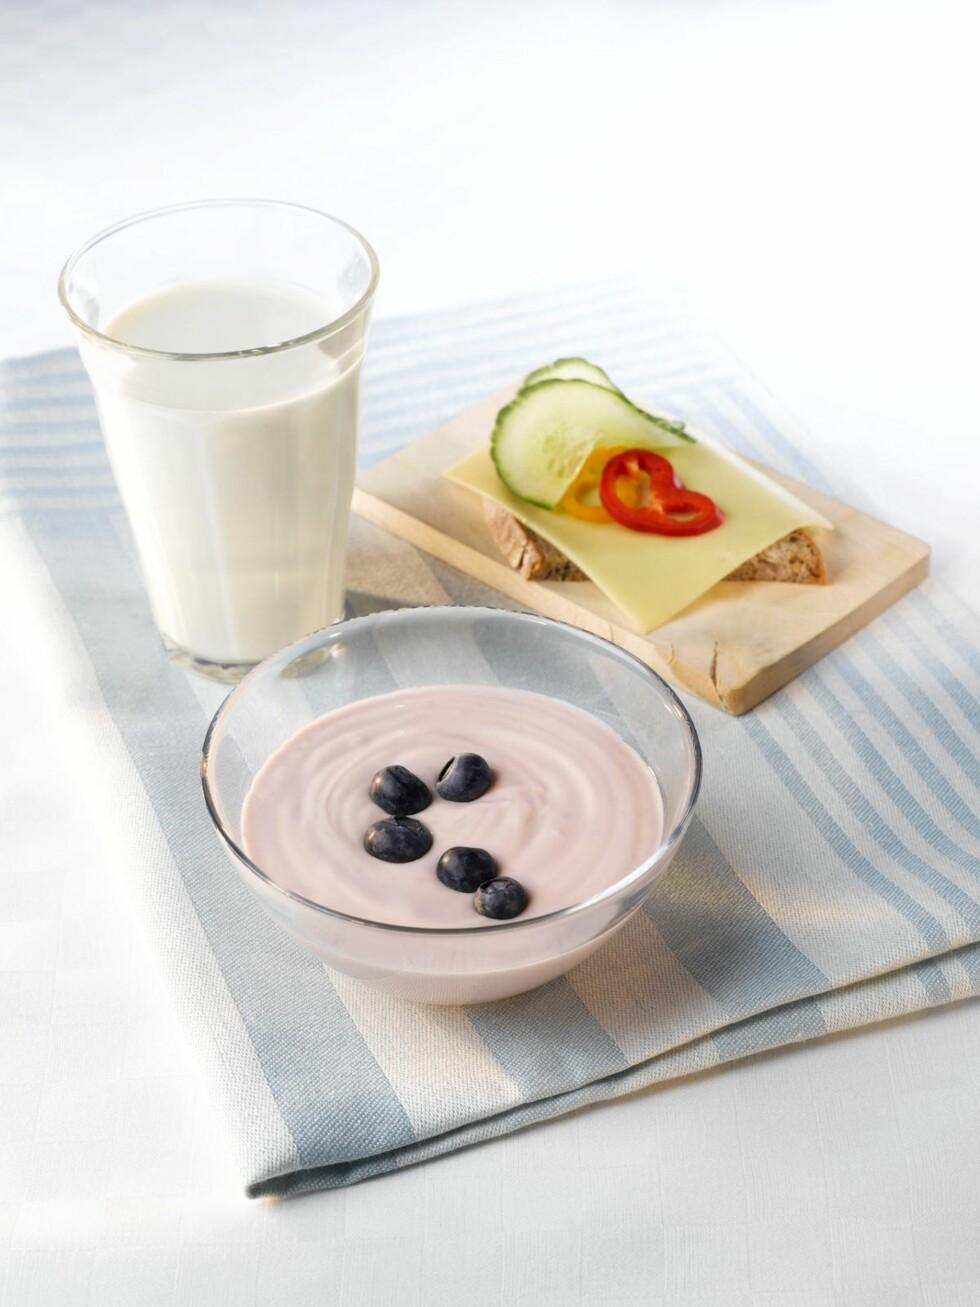 TRE OM DAGEN: Et glass melk, en brødskive med ost og en skål yoghurt.  Foto: Melk.no